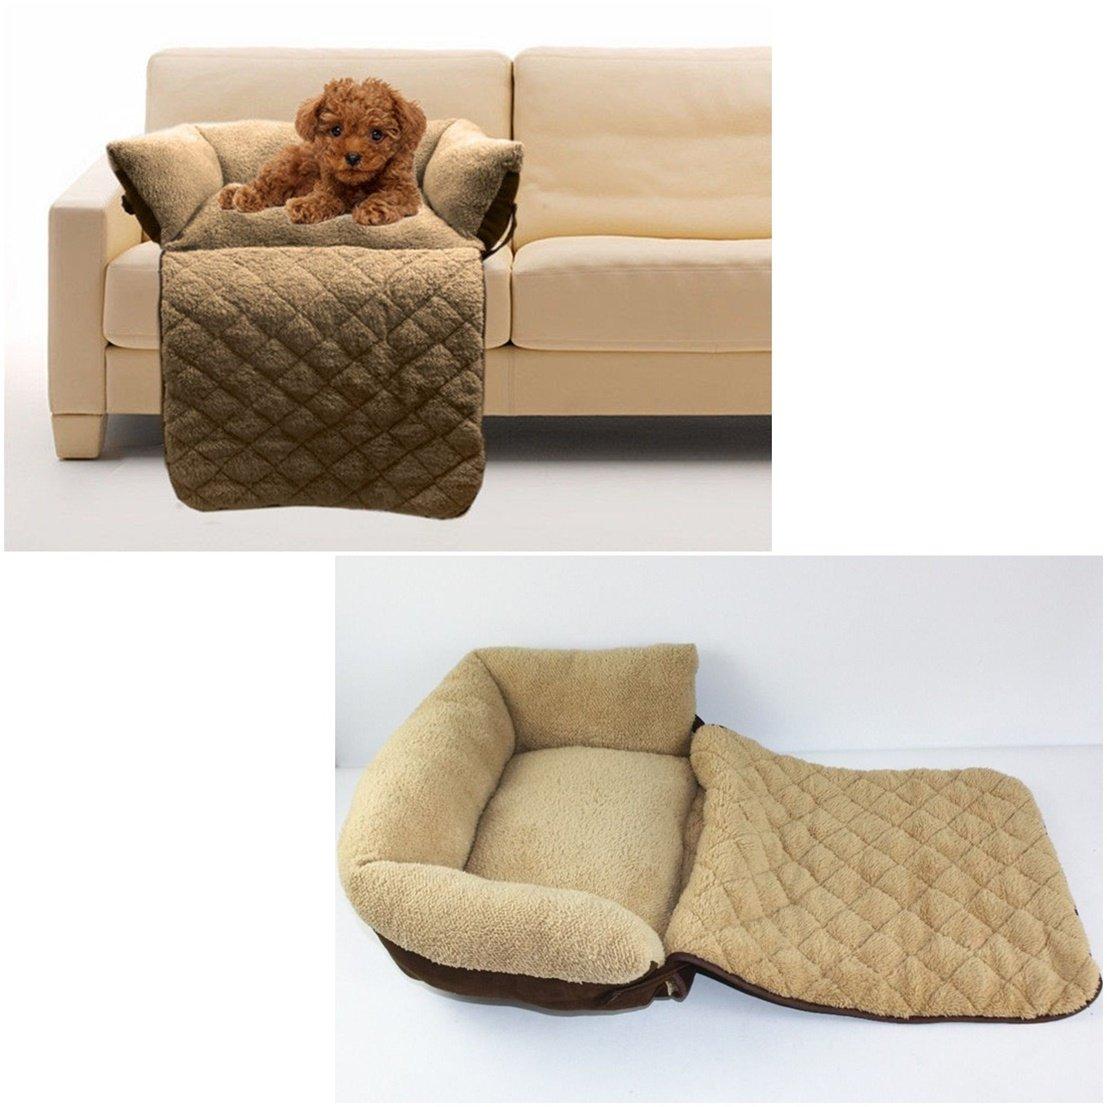 1Pc Luxurious Popular Pet Sofa Bed Size L Suede Fabric Cat Plush Short Cushion Color Brown